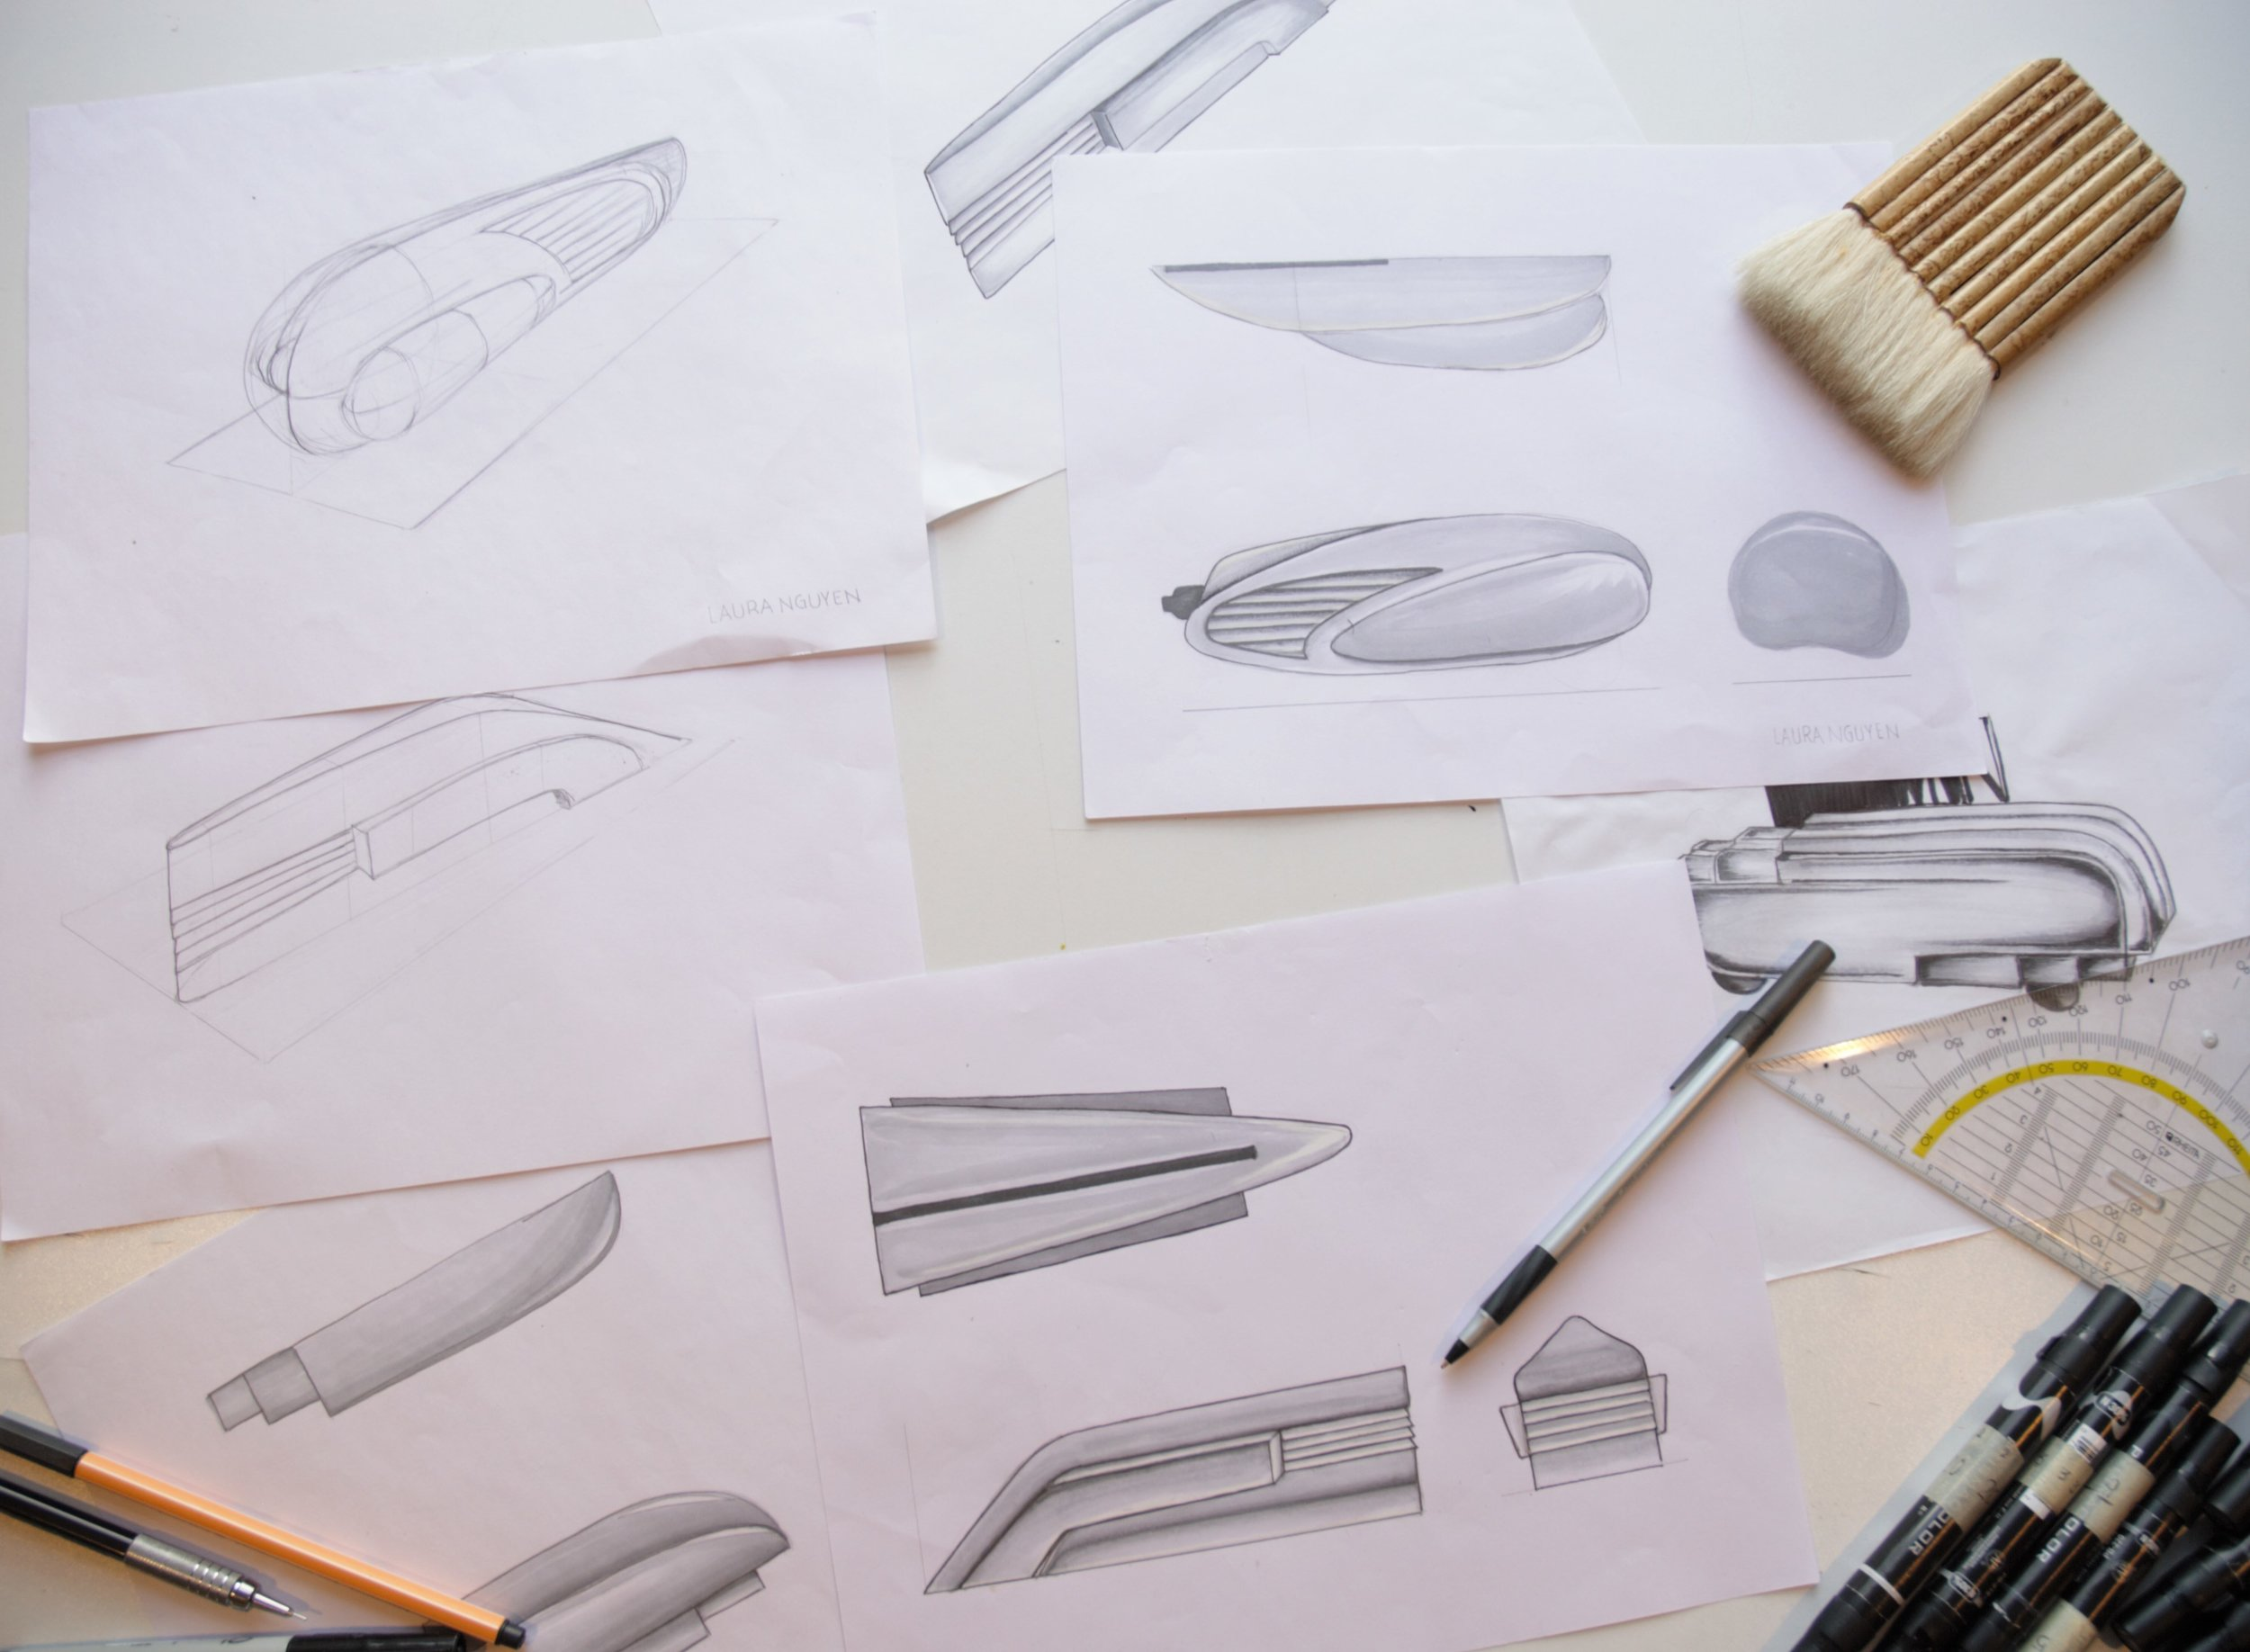 Rocket Car Sketches.jpg